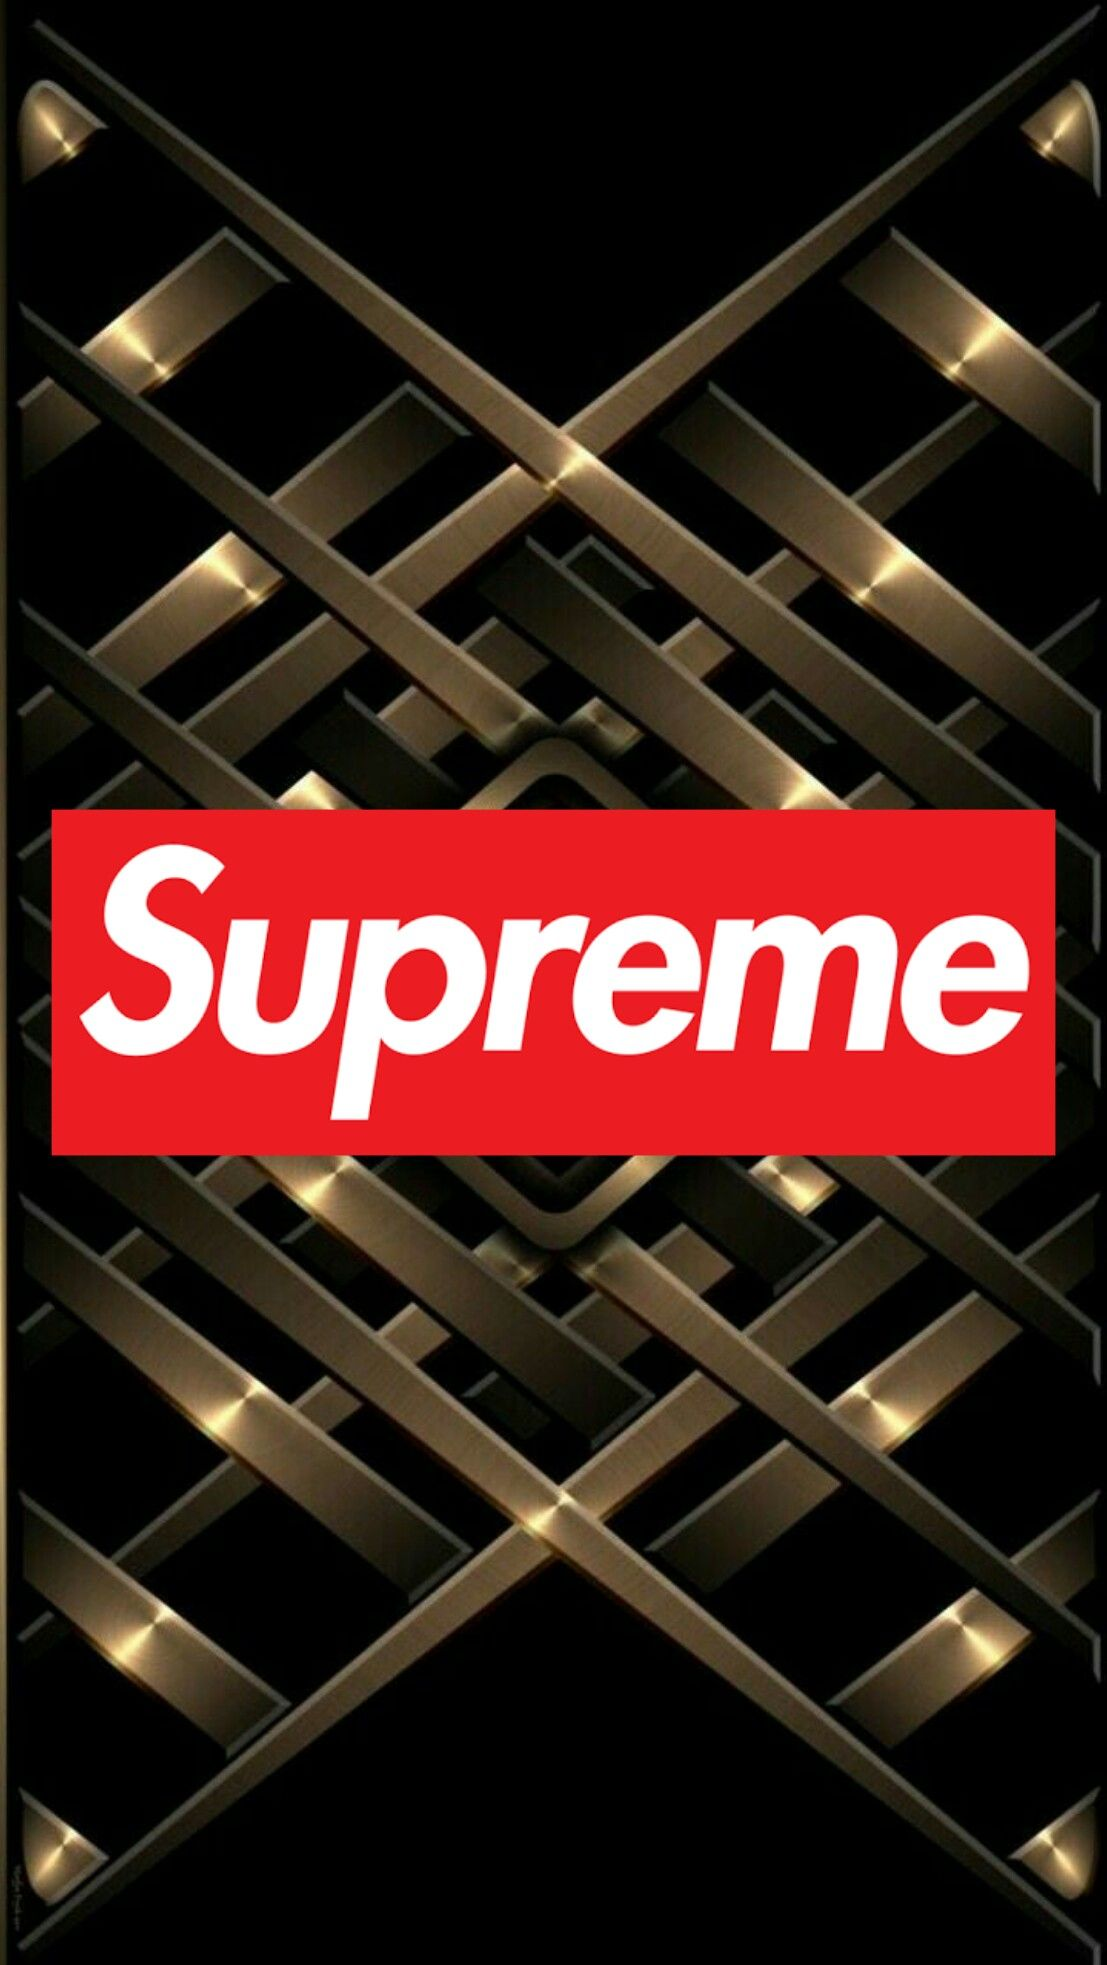 Supreme Gold Wallpapers On Wallpaperdog